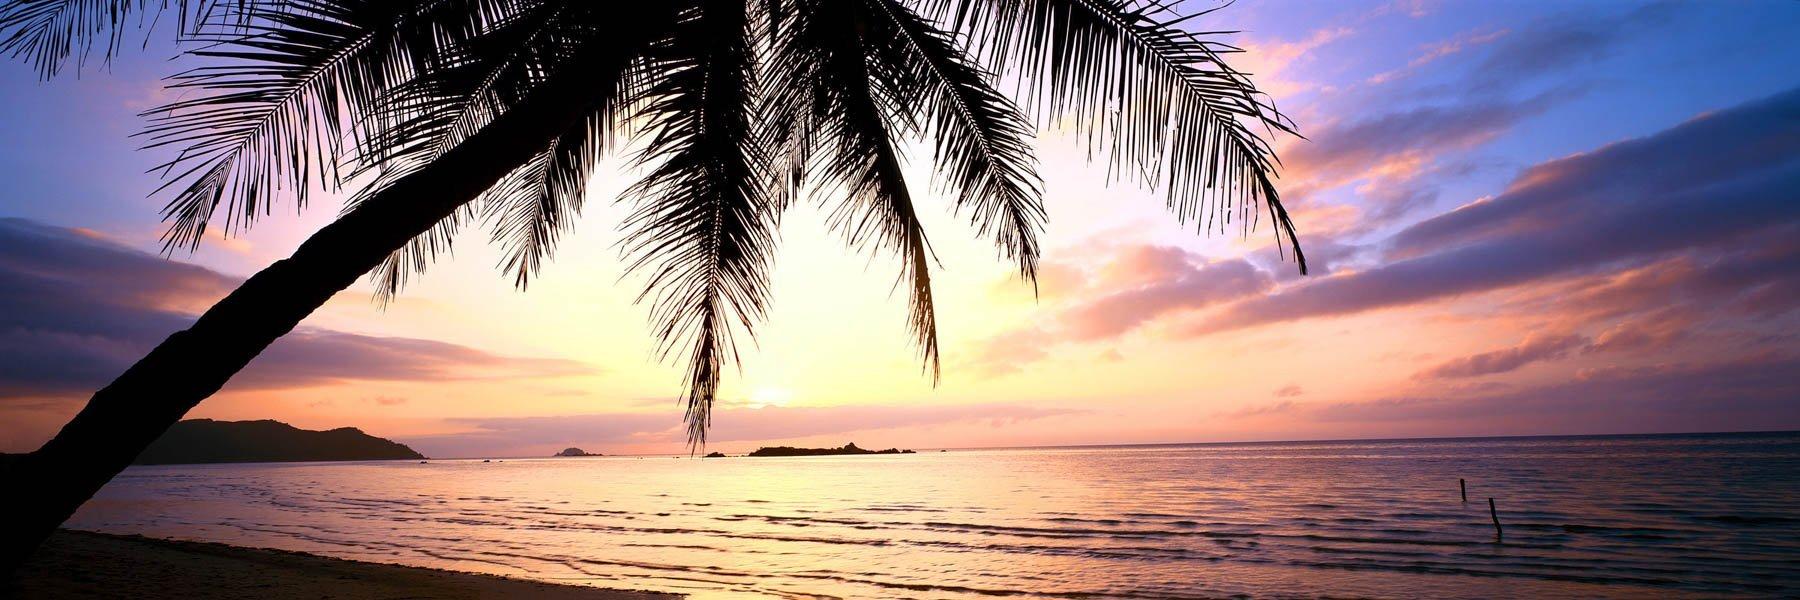 A golden sunrise over Chilli Beach, Cape York, Qld, Australia.